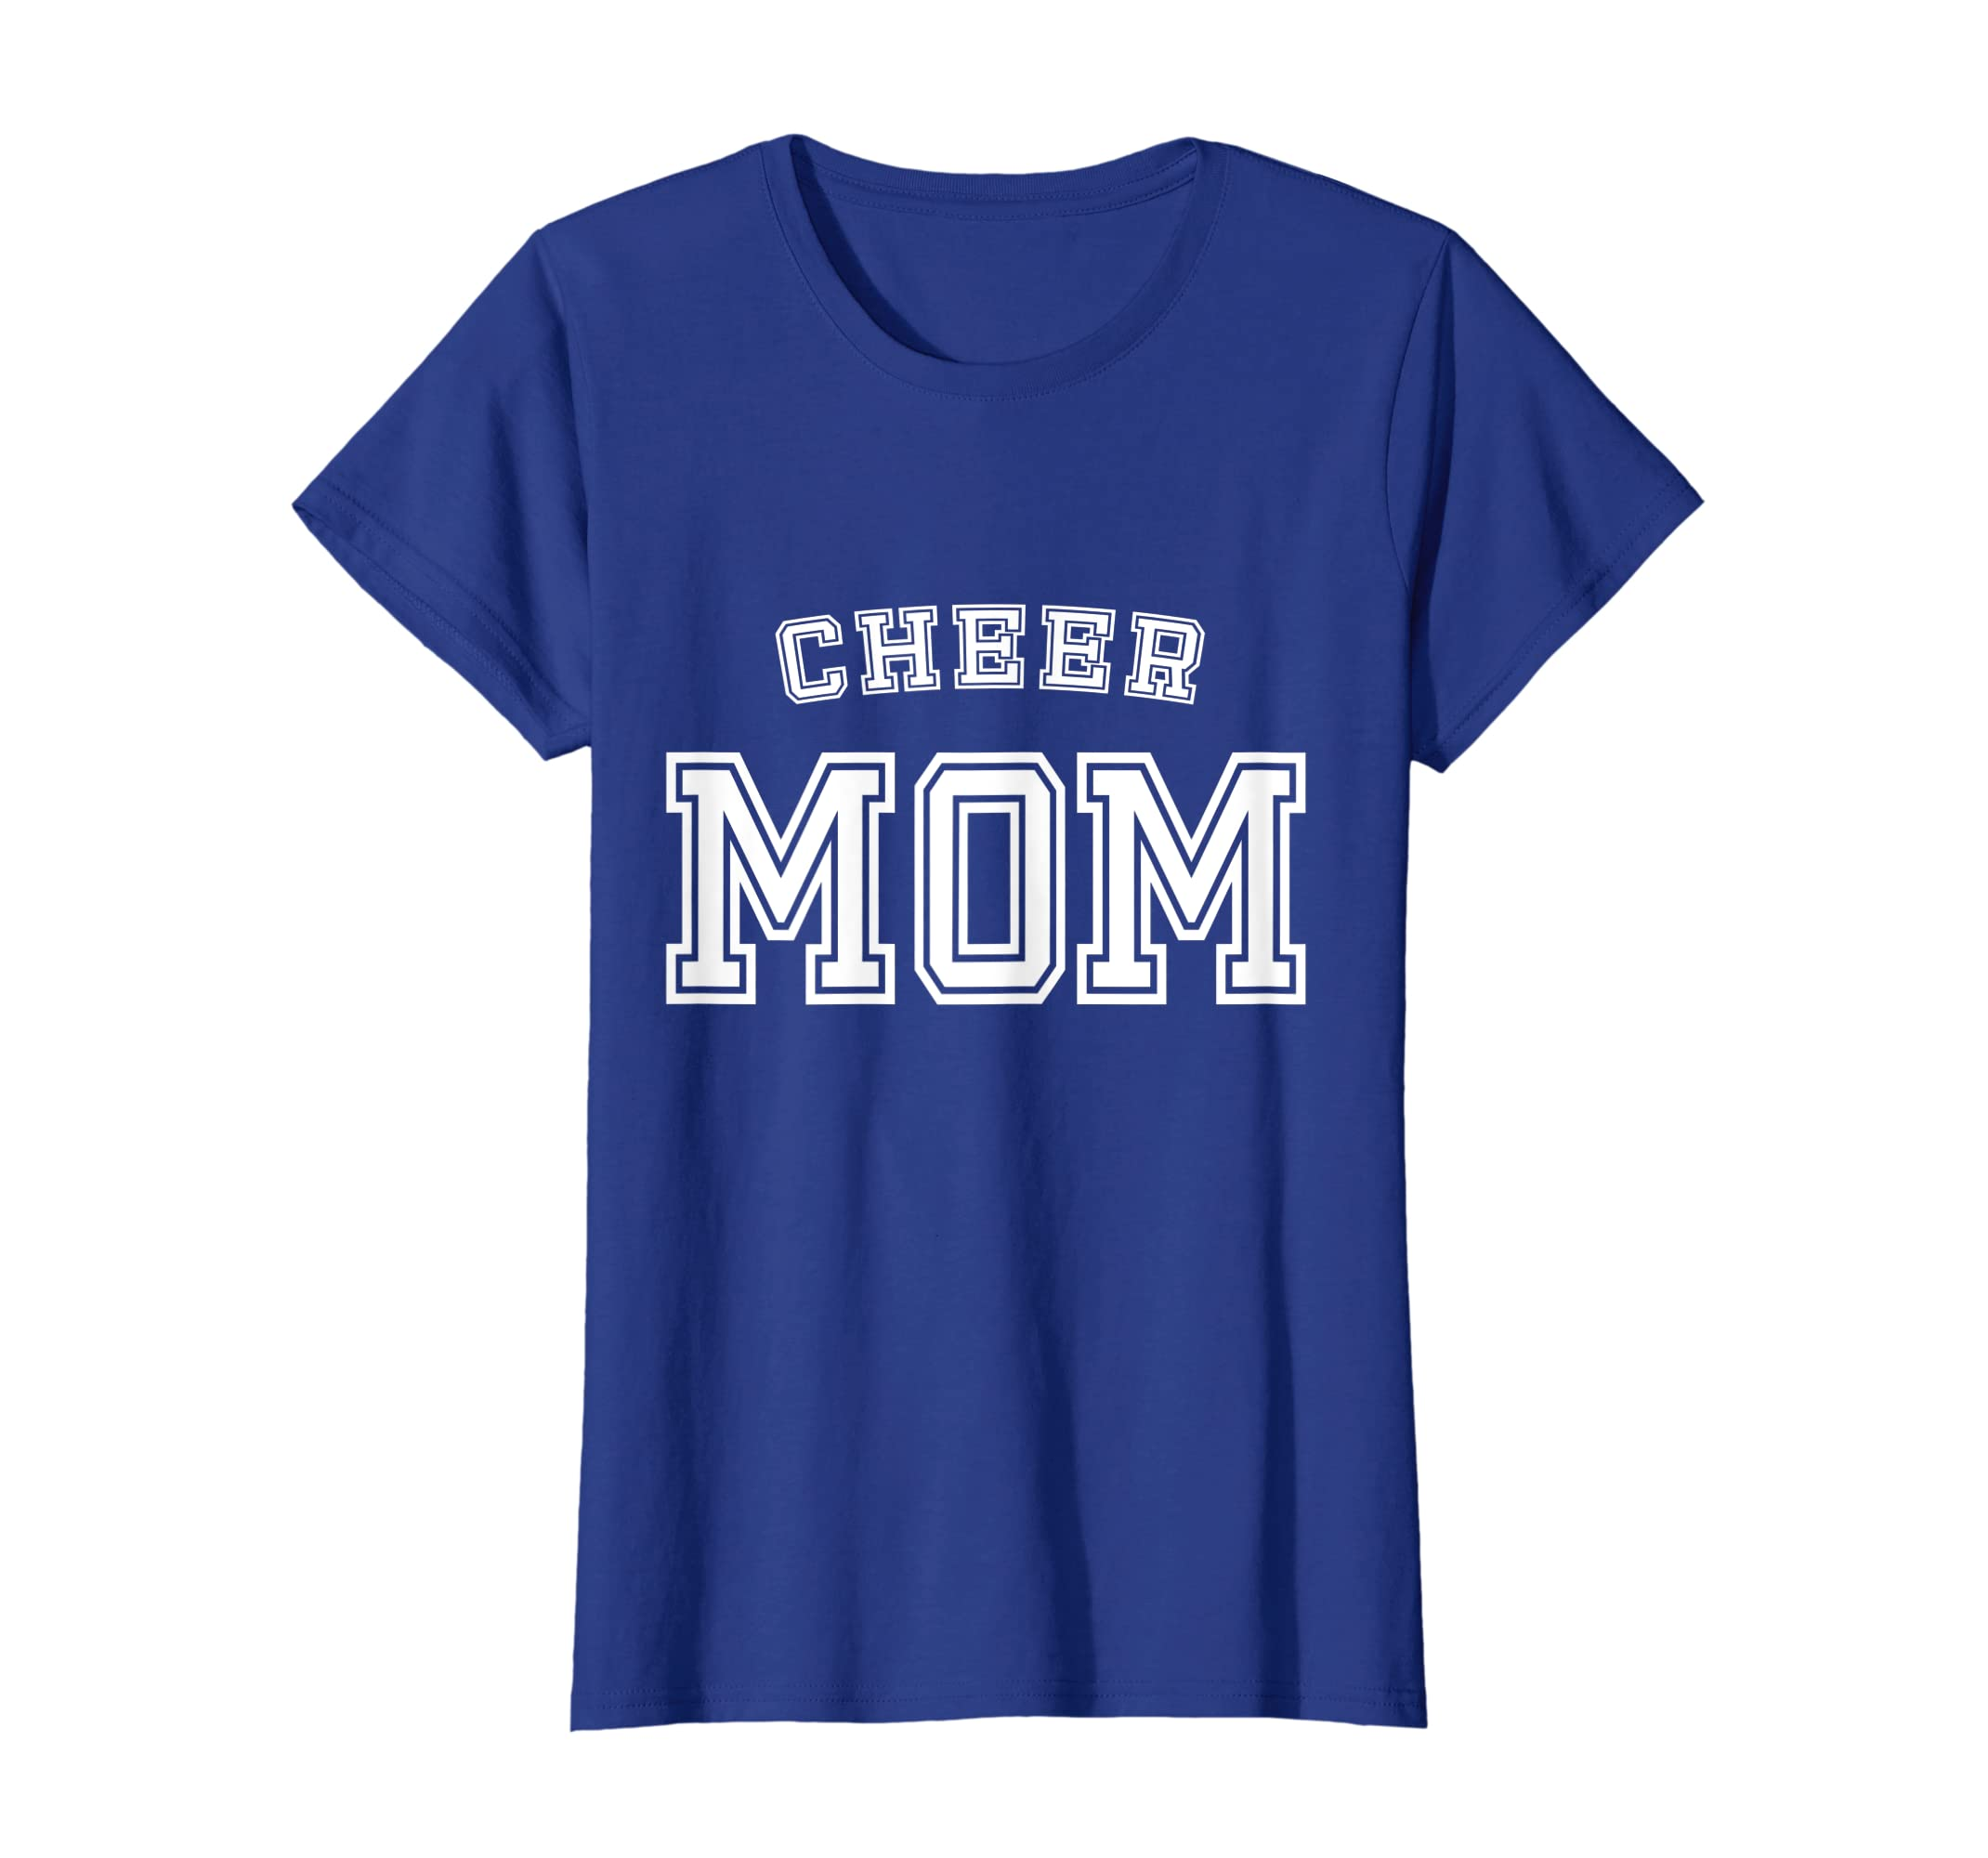 dcc27dda488a Amazon.com: Cheer Mom Team Squad Cheerleader Mother Cute Funny T-Shirt:  Clothing